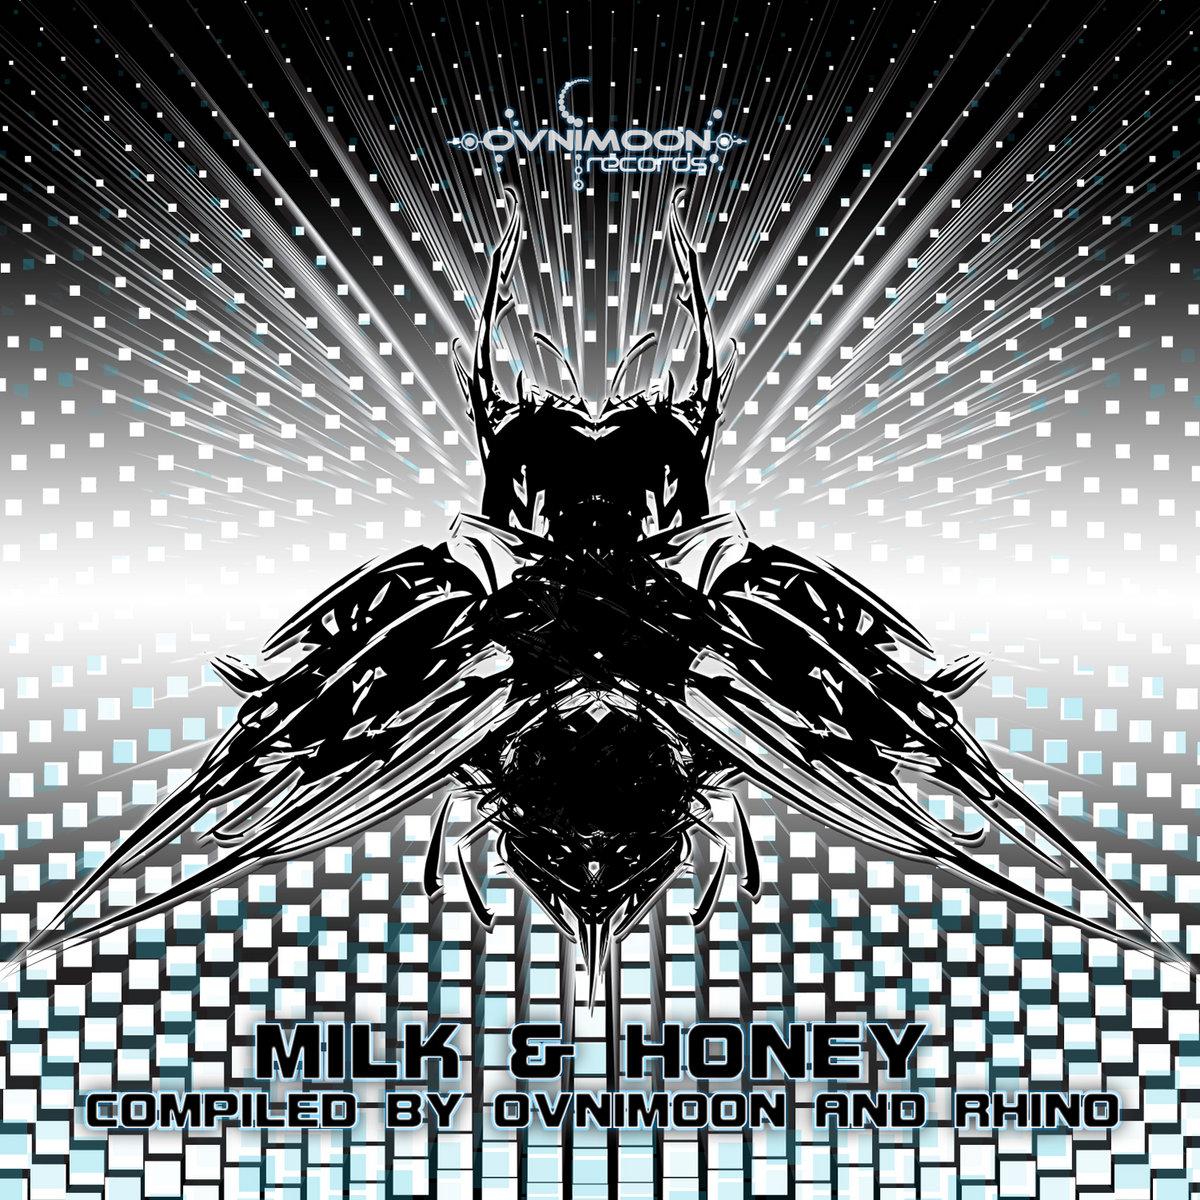 Milk & Honey VA by Rhino and Ovnimoon [ovnilp915] (Ovnimoon Records